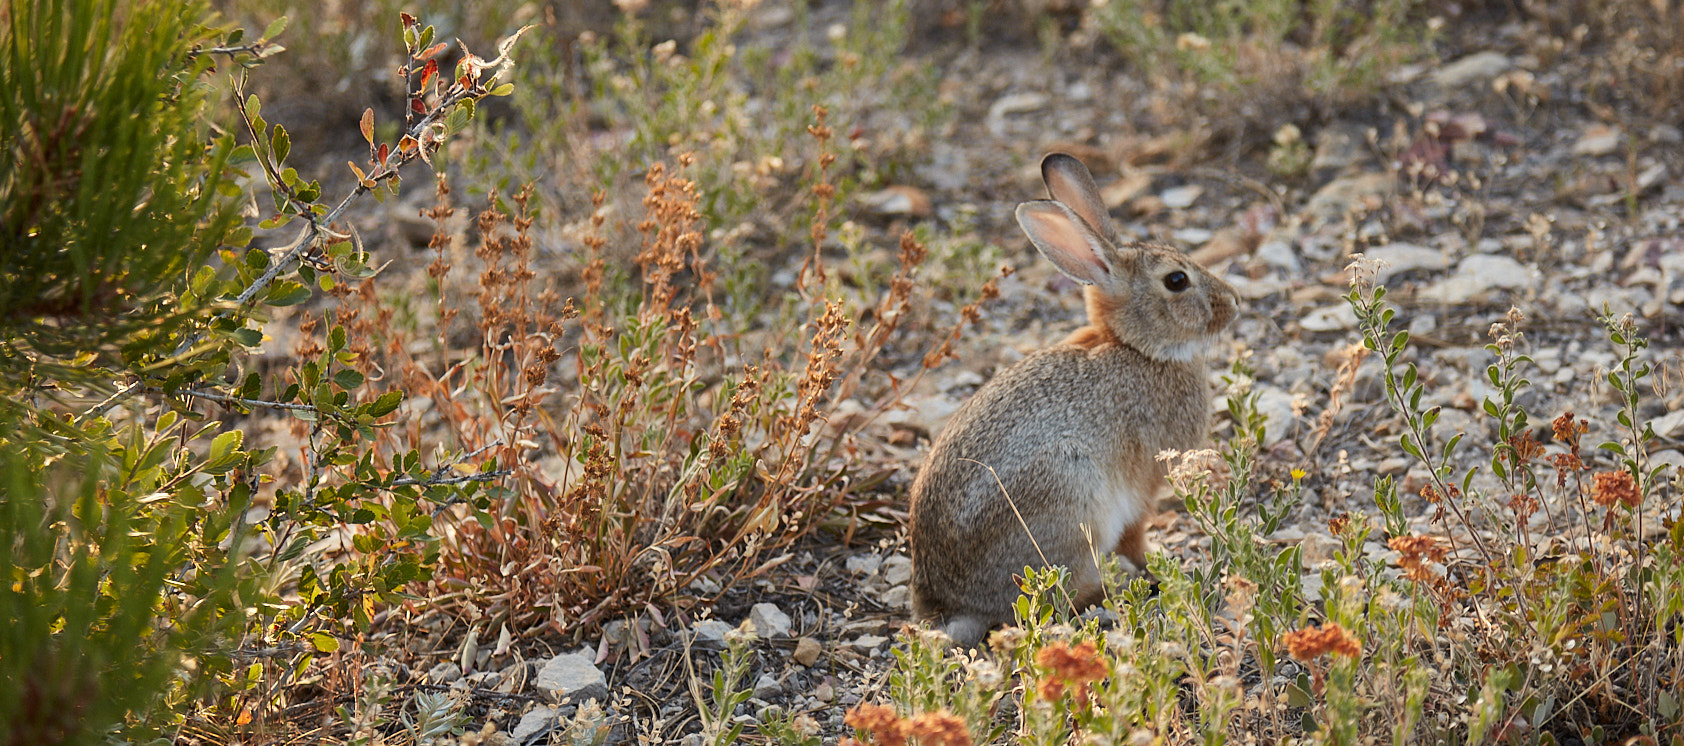 Rabbit on the trail on Dakota Ridge near Denver, CO for Native Roots Cannabis Co.